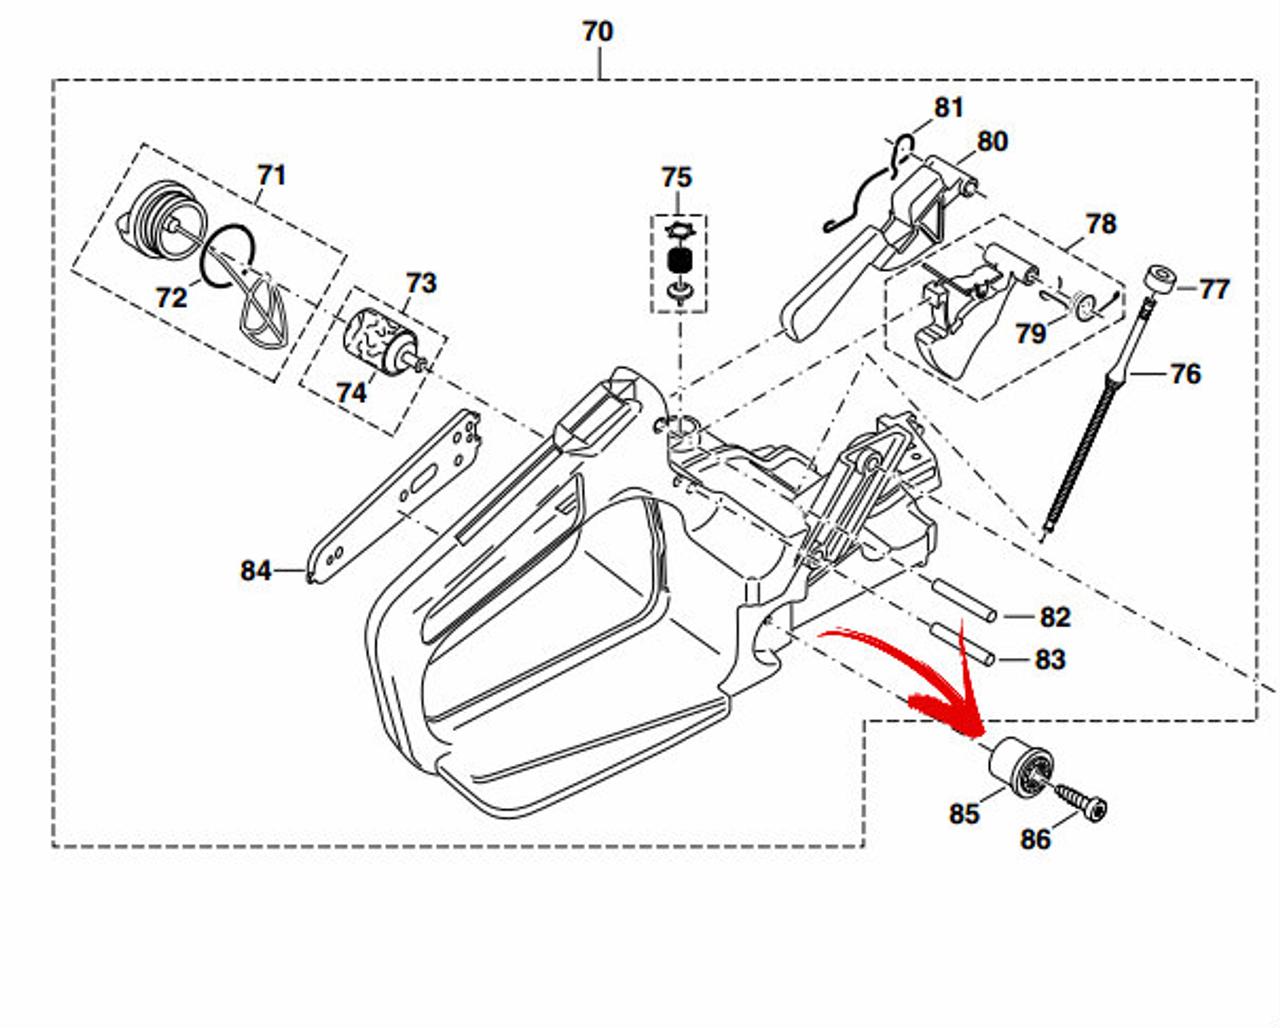 109 // PS43 // PS420C mit 38cm B f Dolmar Sägekette 512484764 325 1,3mm 64E z